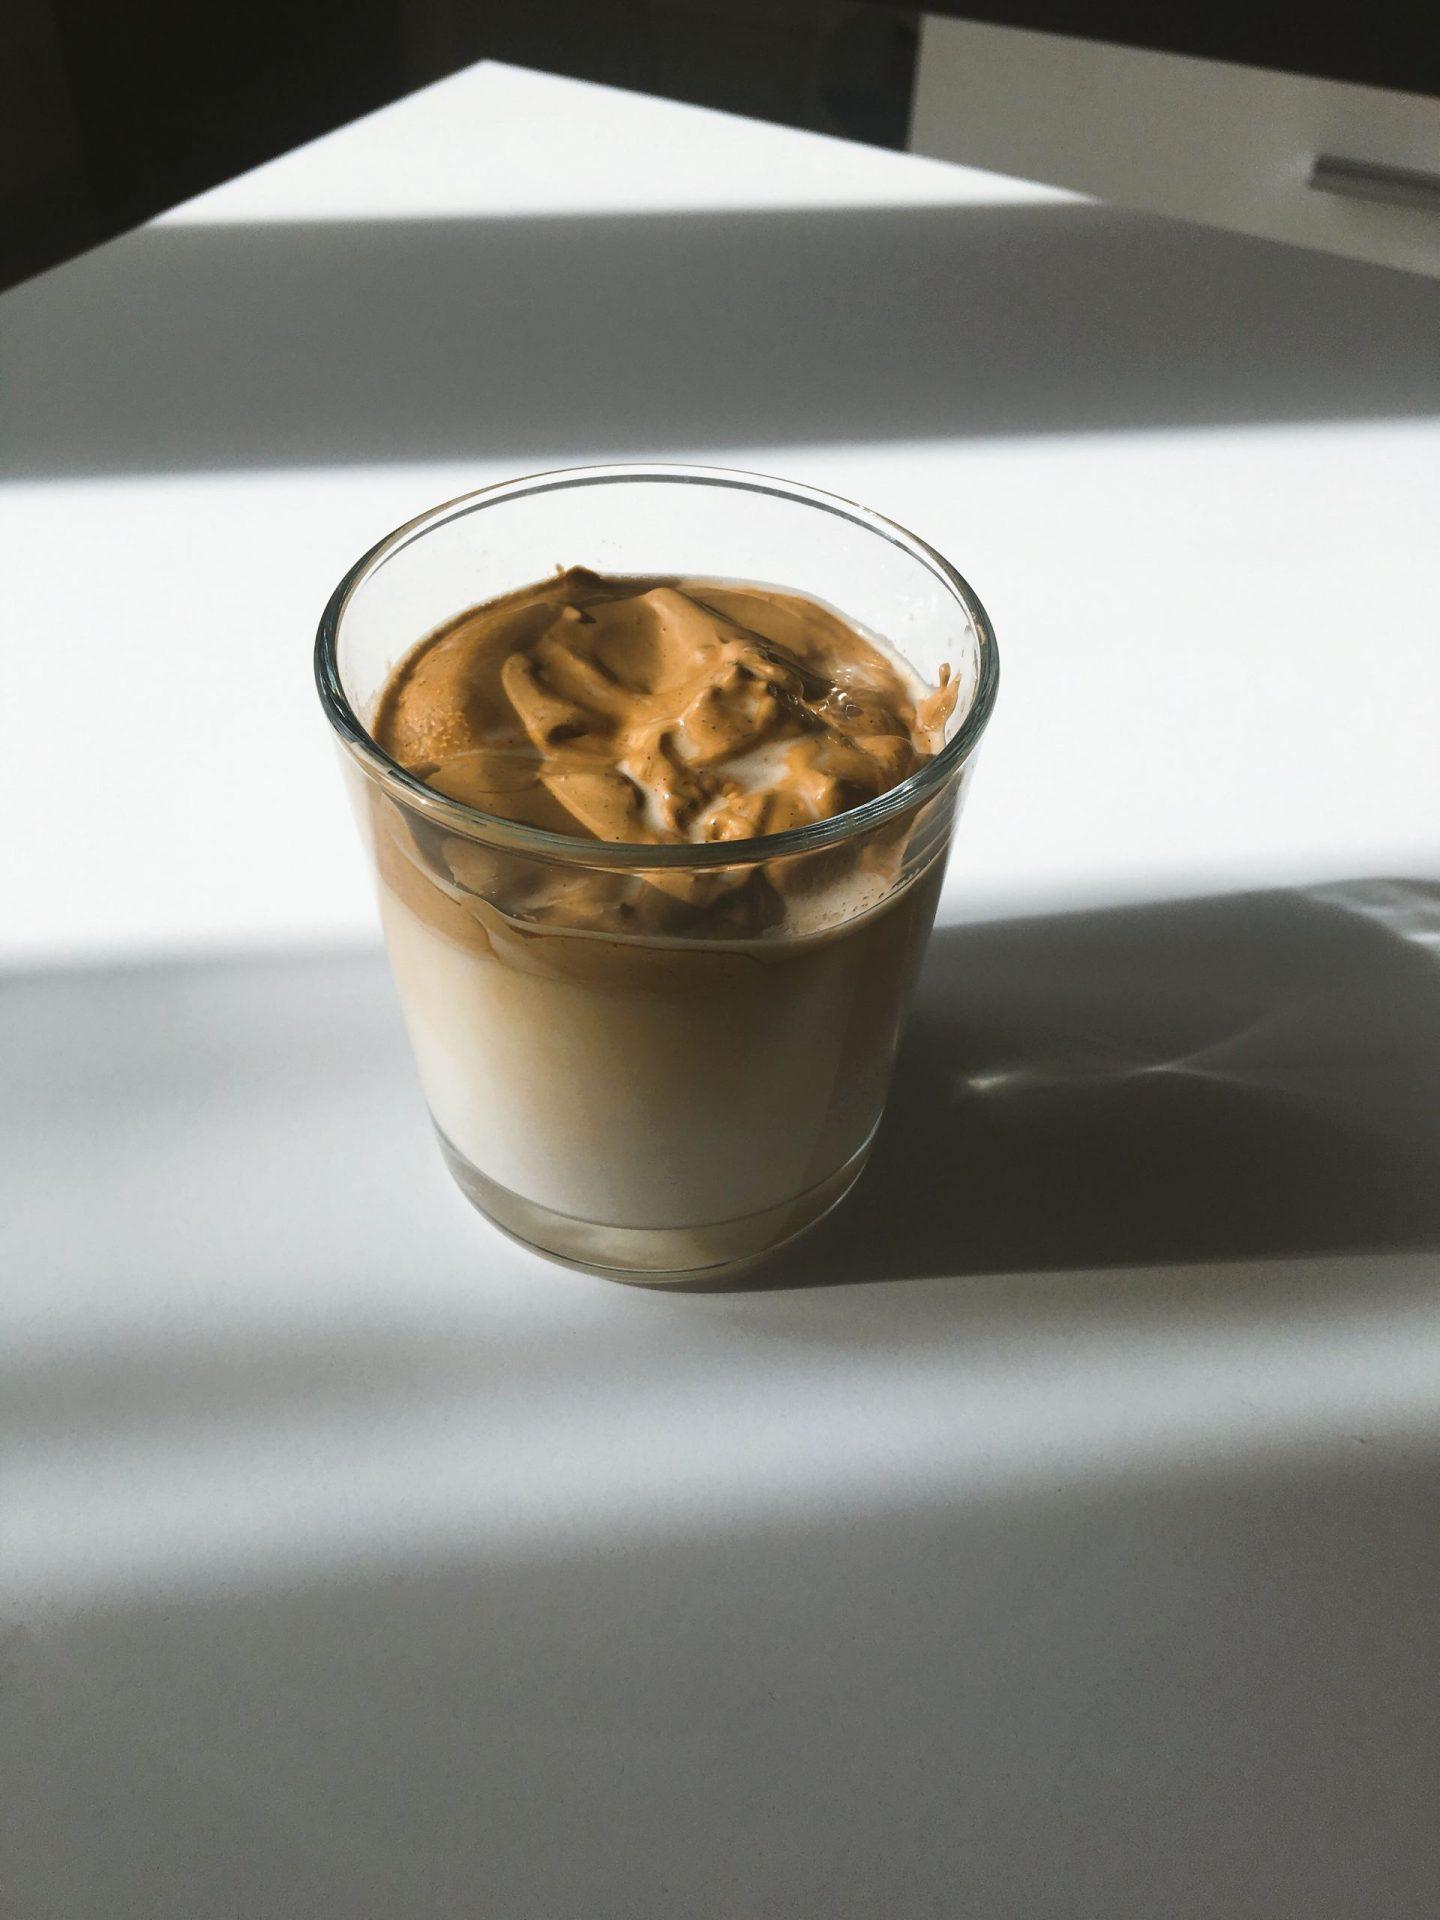 Dalgona Whipped Coffee is the new Banana Bread